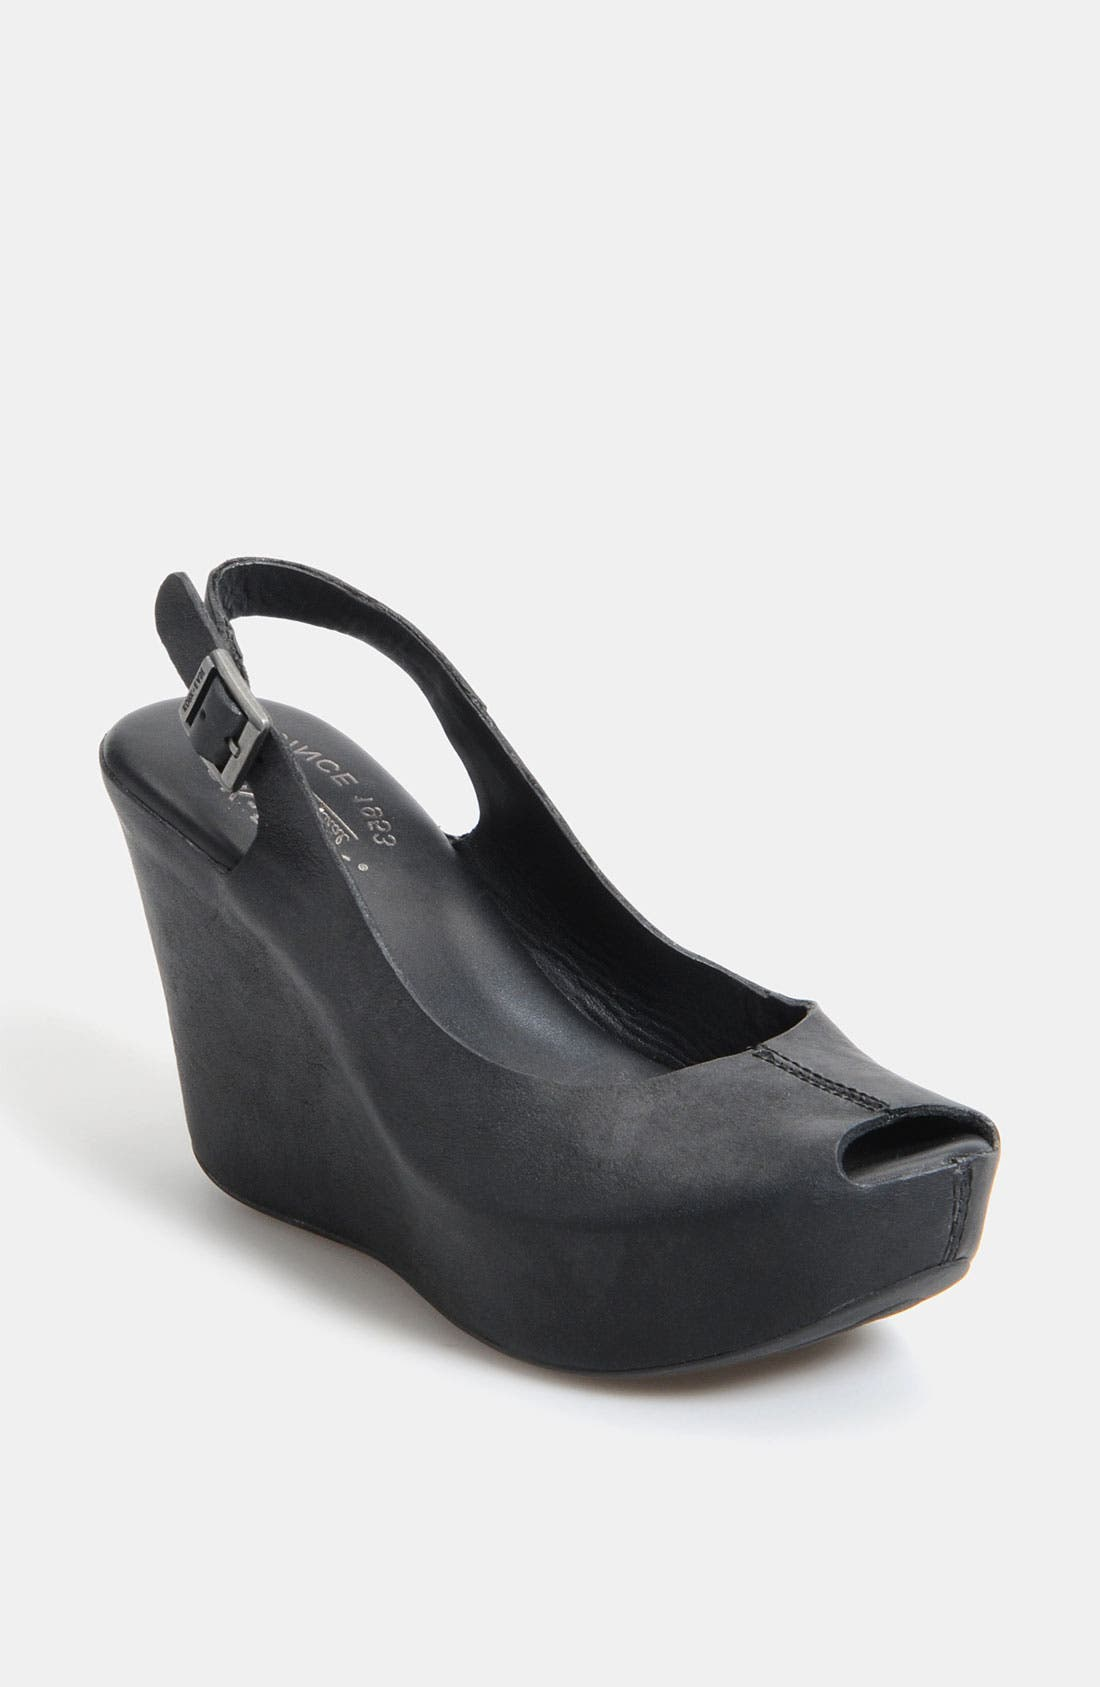 Alternate Image 1 Selected - Kork-Ease 'Sarah' Sandal